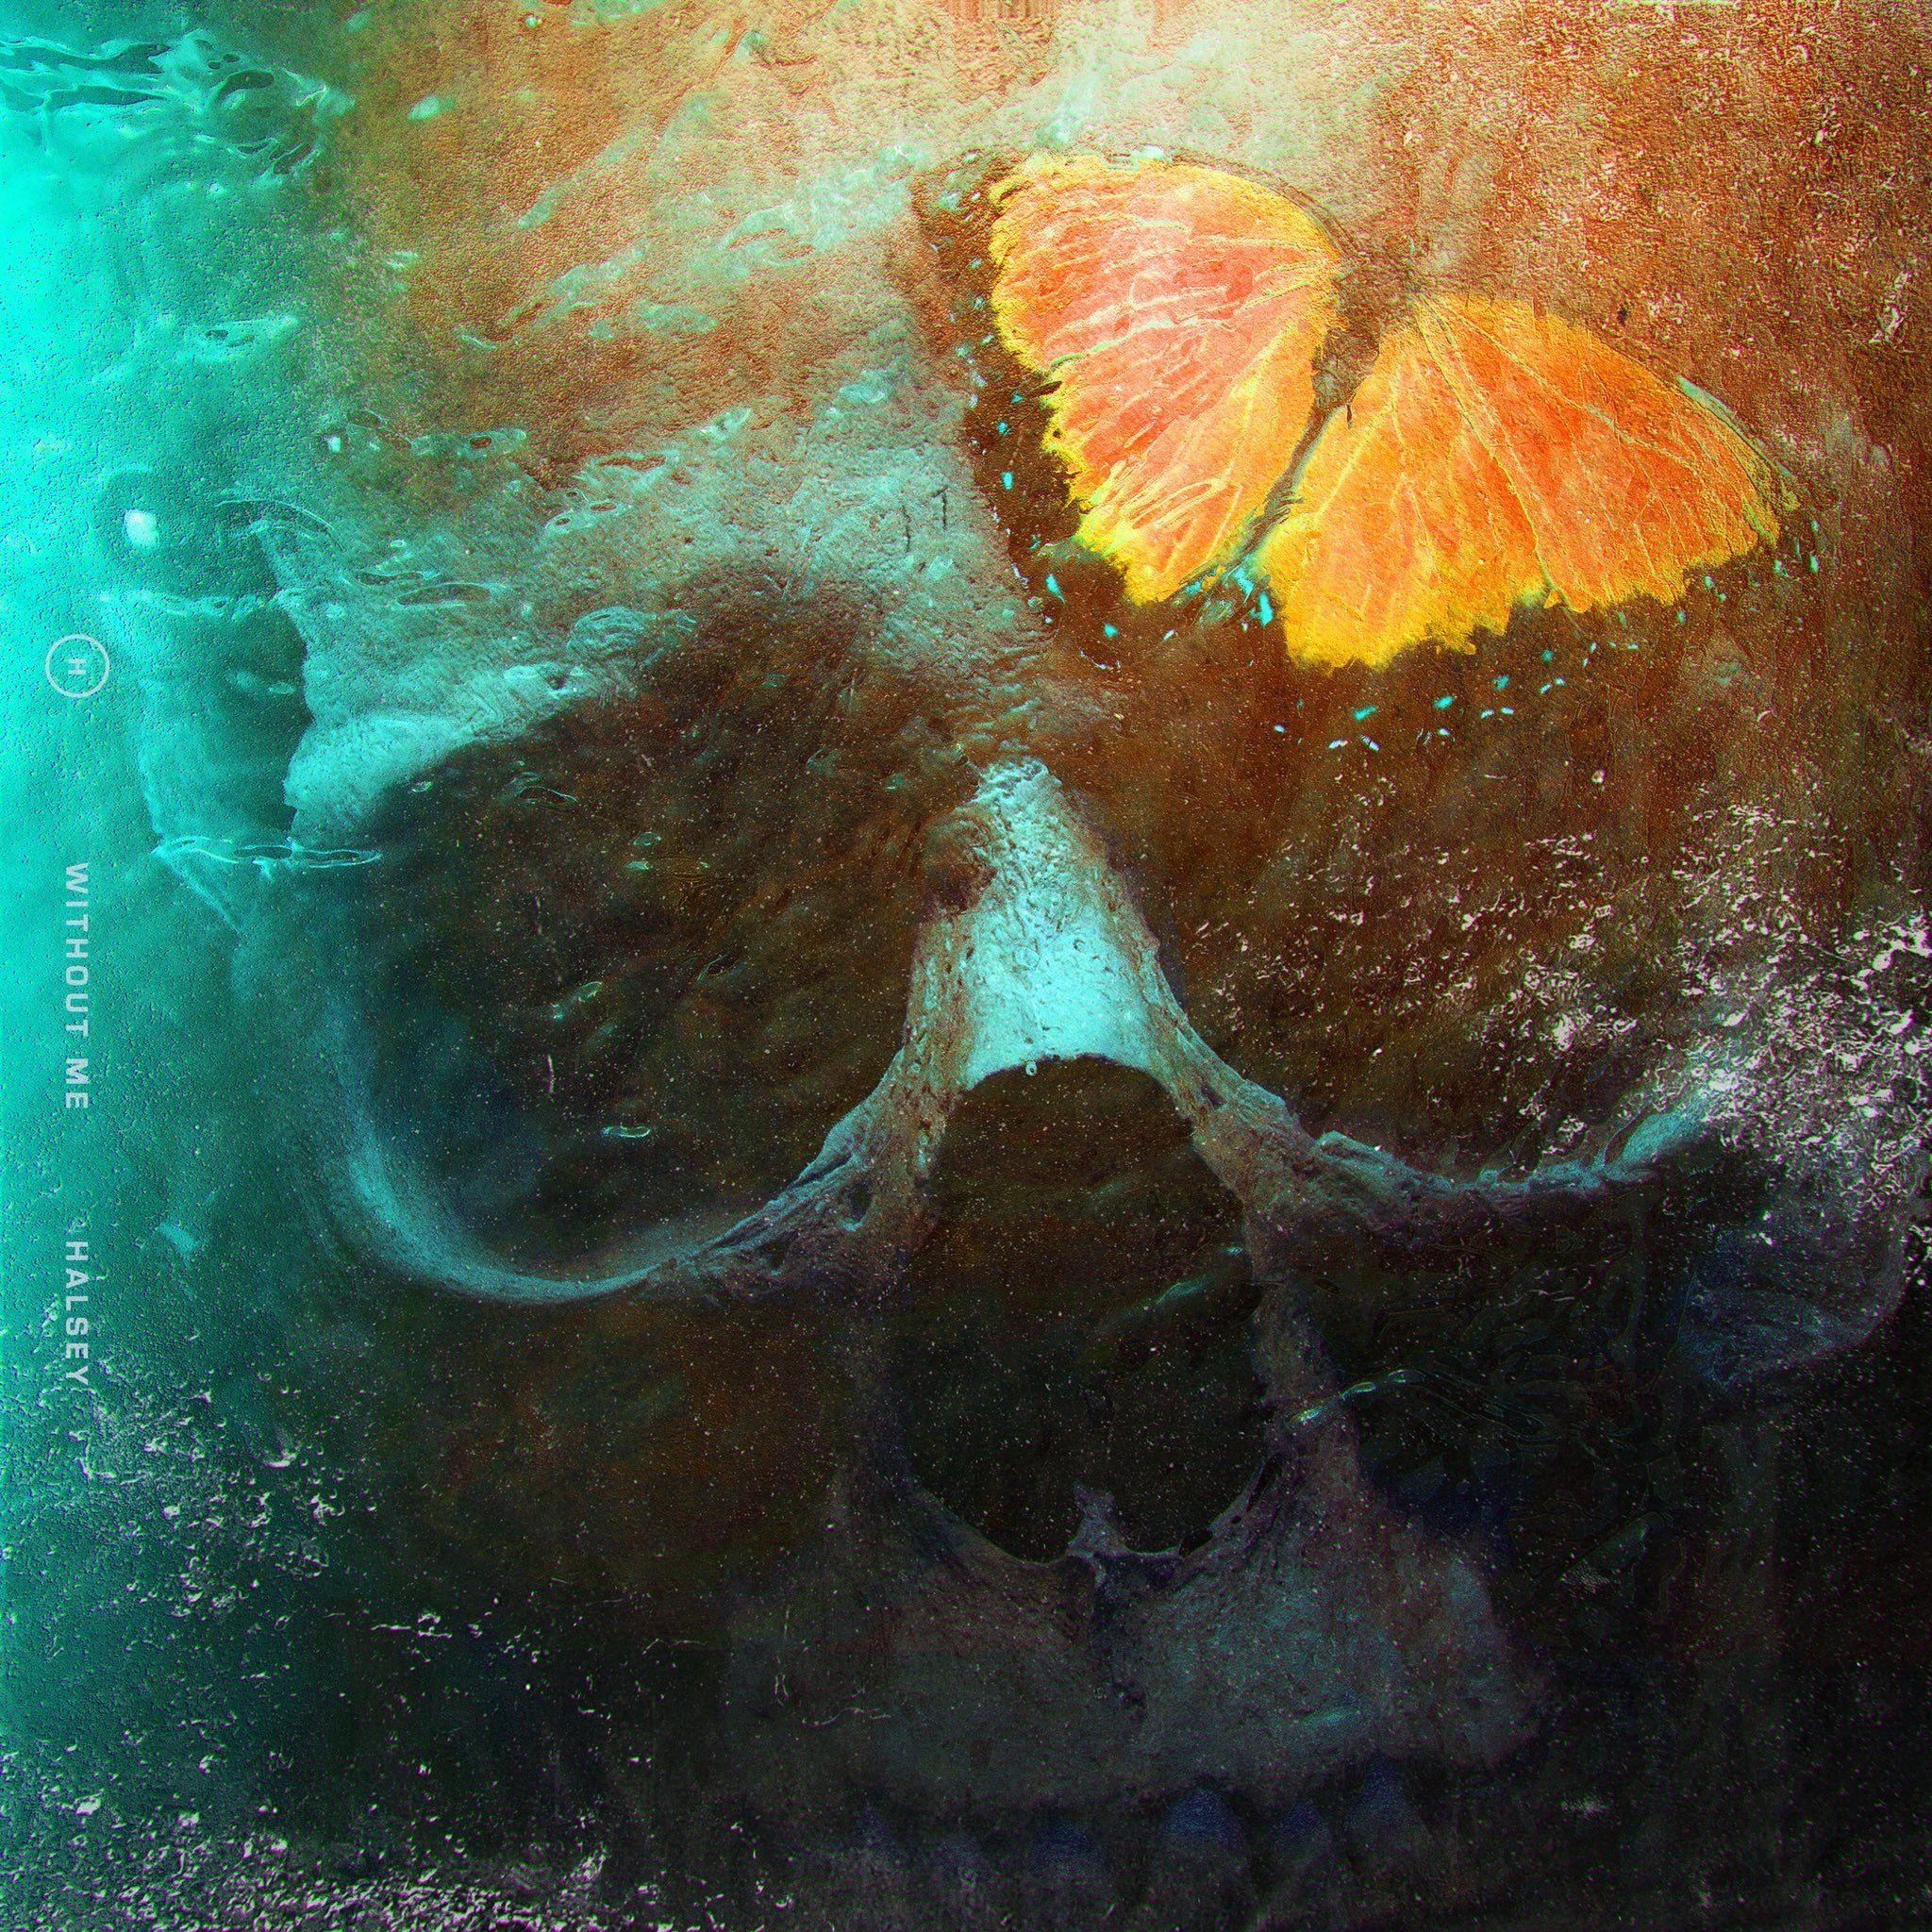 Halsey Badlands Uo Exclusive Lp Mp3 Music Cover